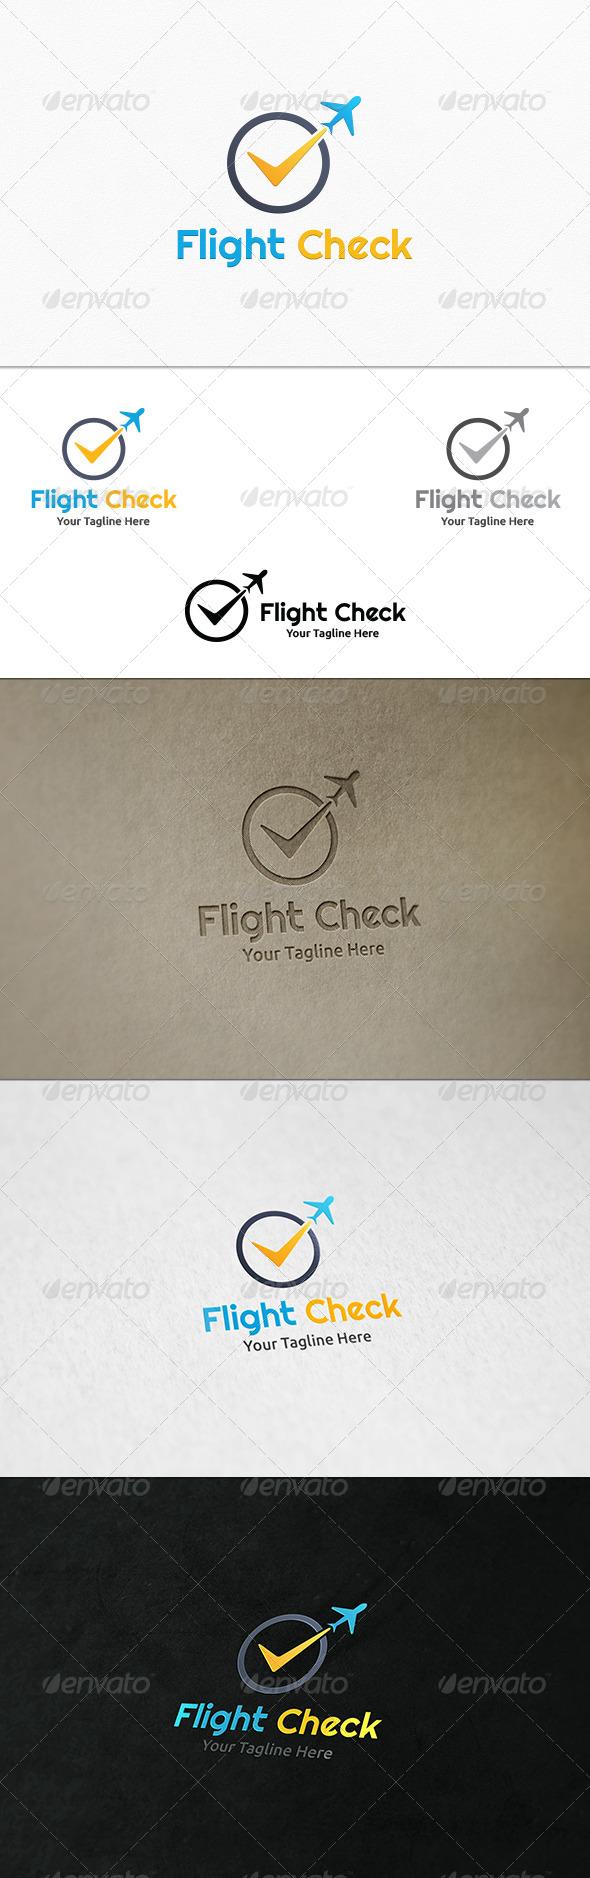 GraphicRiver Flight Check Logo Template 7893527